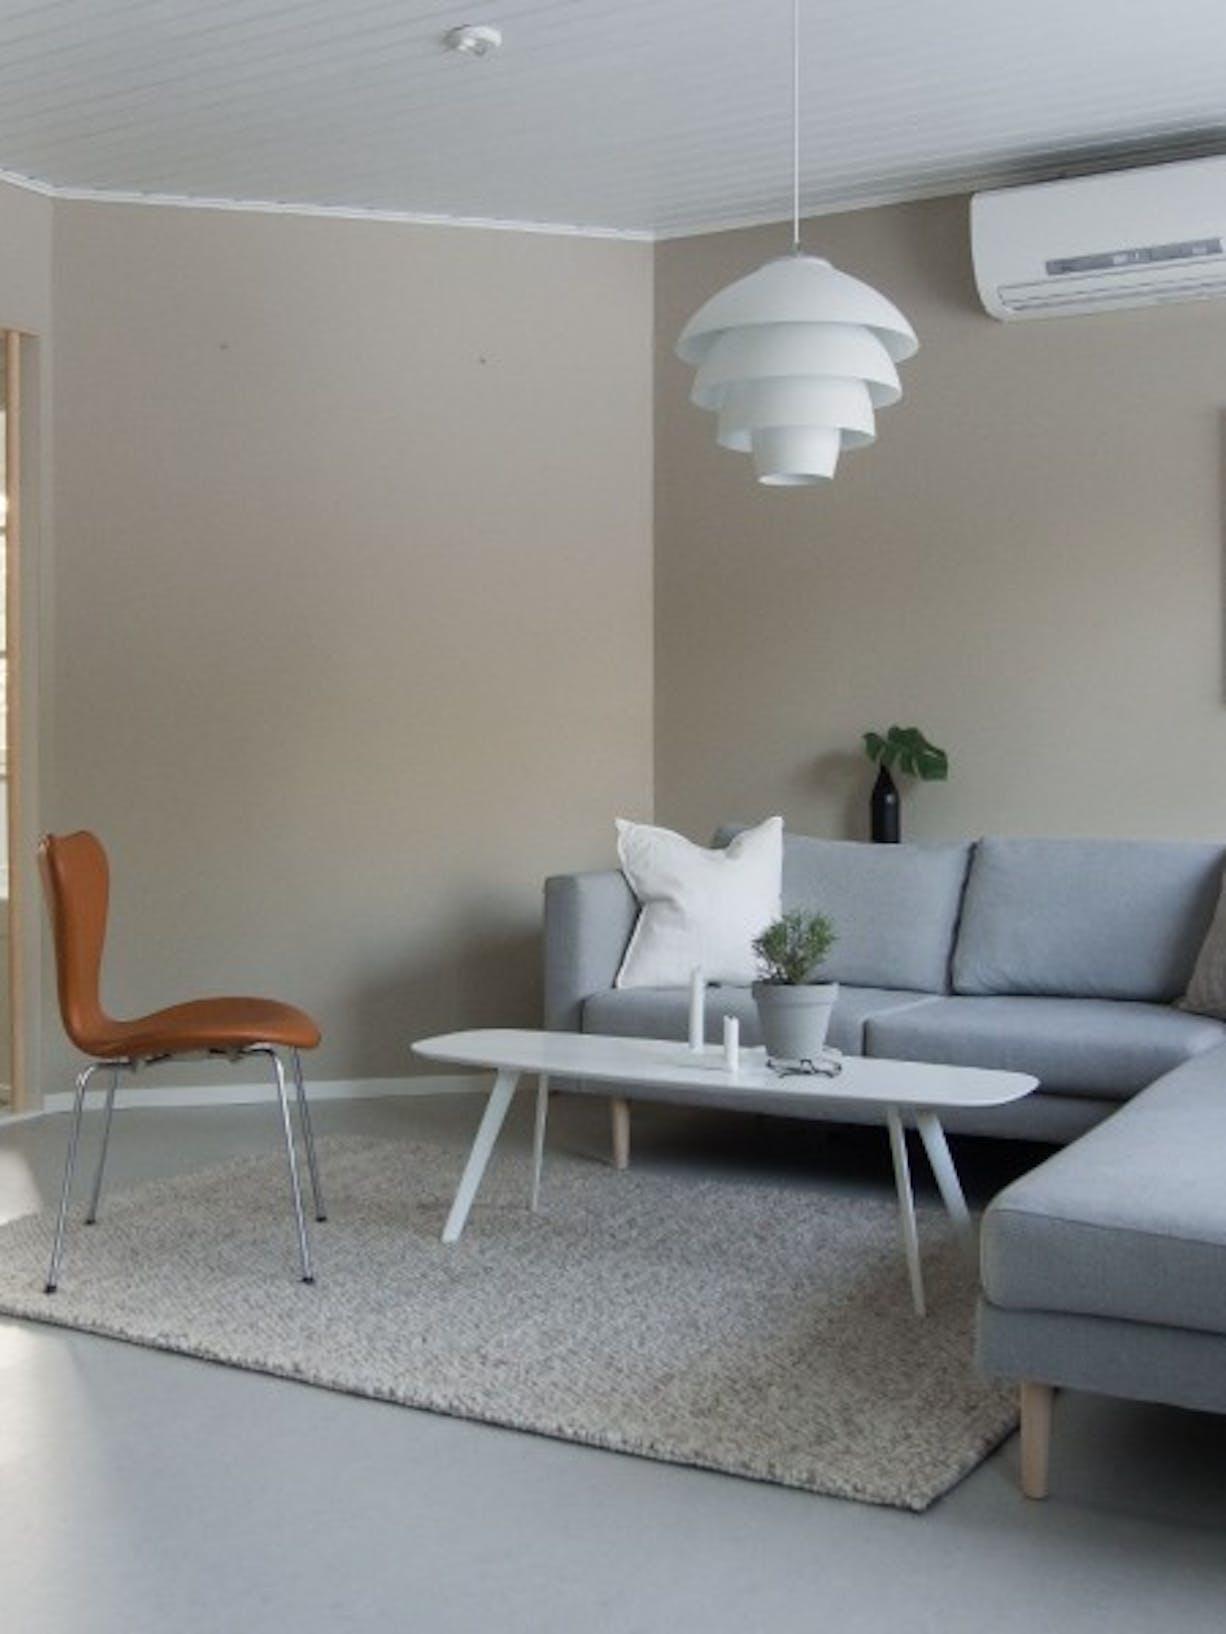 Tikkurila White Paint Living Room Refresh wide before